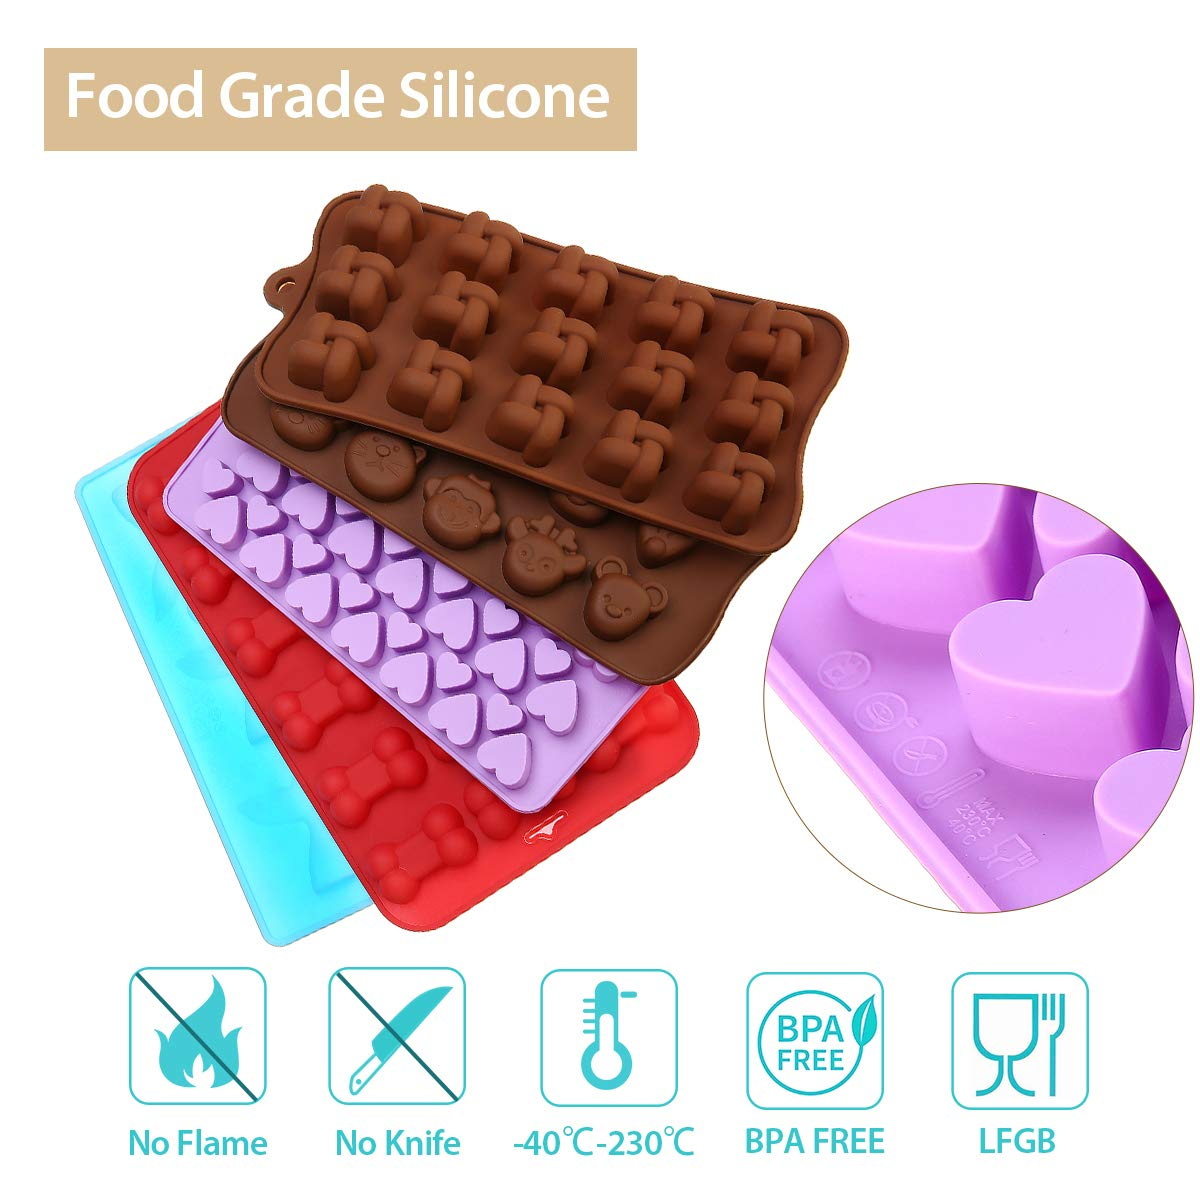 Molde de Silicona Jeteven Moldes para hacer Bombones de Chocolate Repostería Acopio Mini Galletas Cubitos de Hielo Bajones Caramelo de Chocolate (paquete de ...